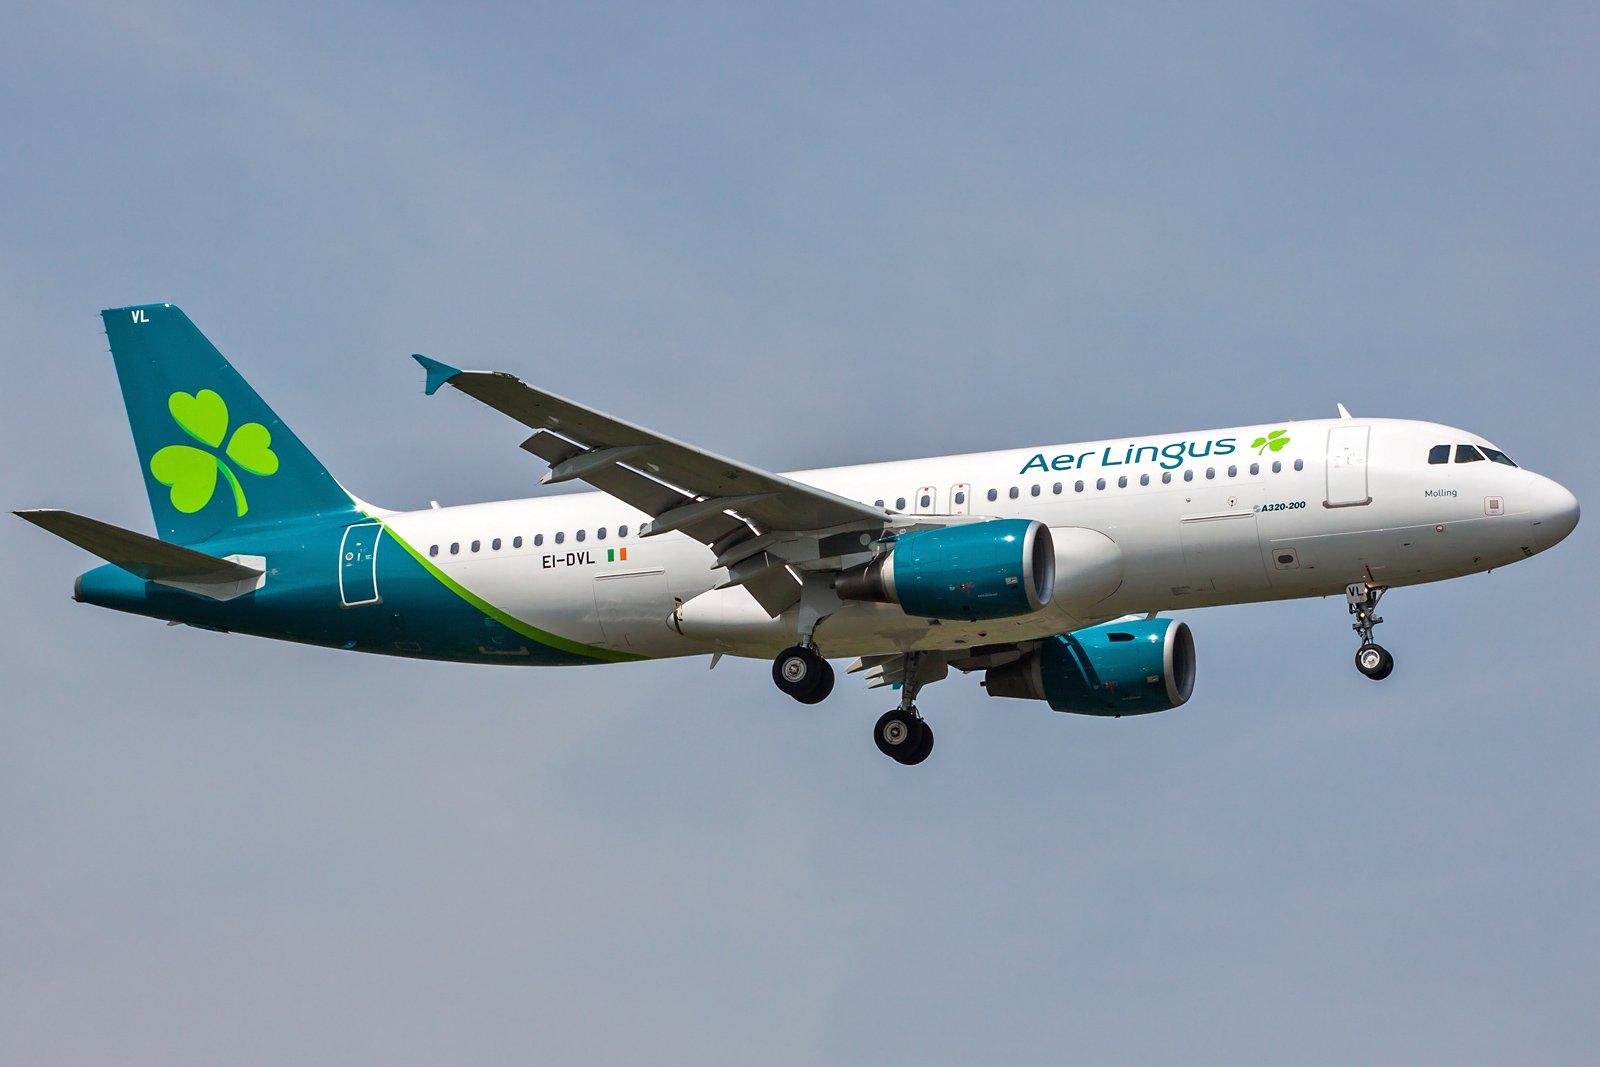 Aer Lingus Airbus A320-214 EI-DVL